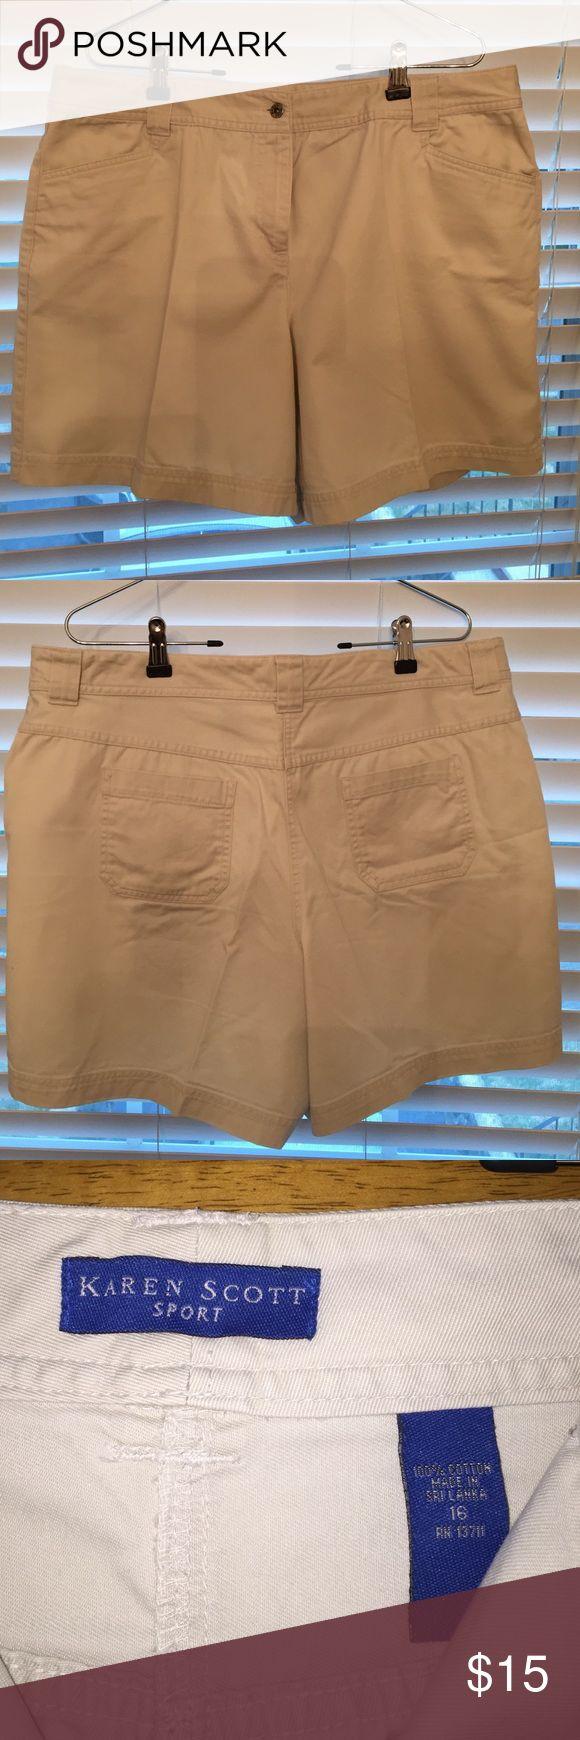 Flash Sale..final drop...Karen Scott Sport Shorts. Karen Scott Sport shorts, 100% Cotton. Beige. These shorts have been worn about three times. Karen Scott Shorts